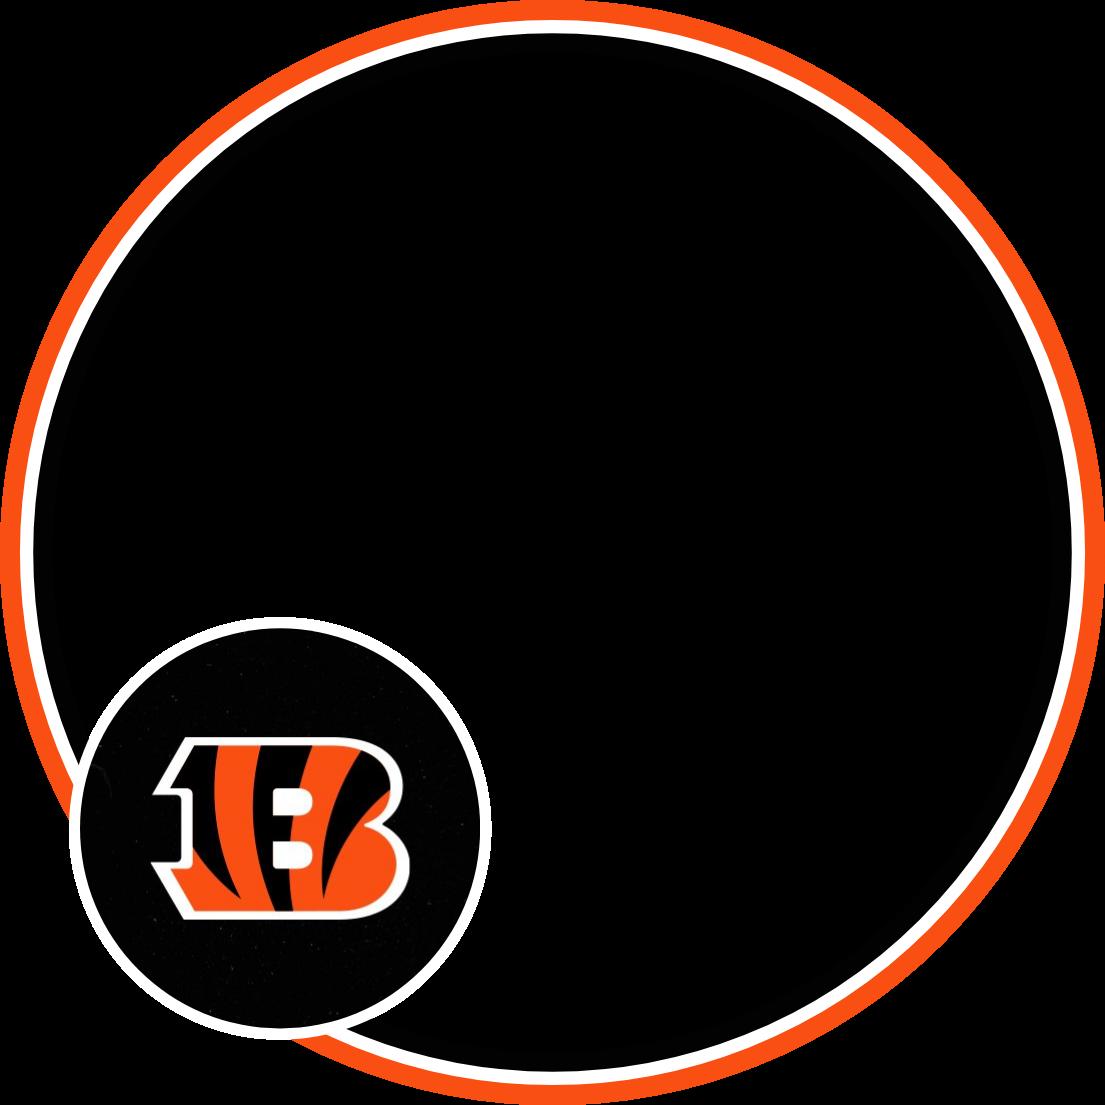 A transparent NFL profile picture frame for the Cincinnati Bengals.